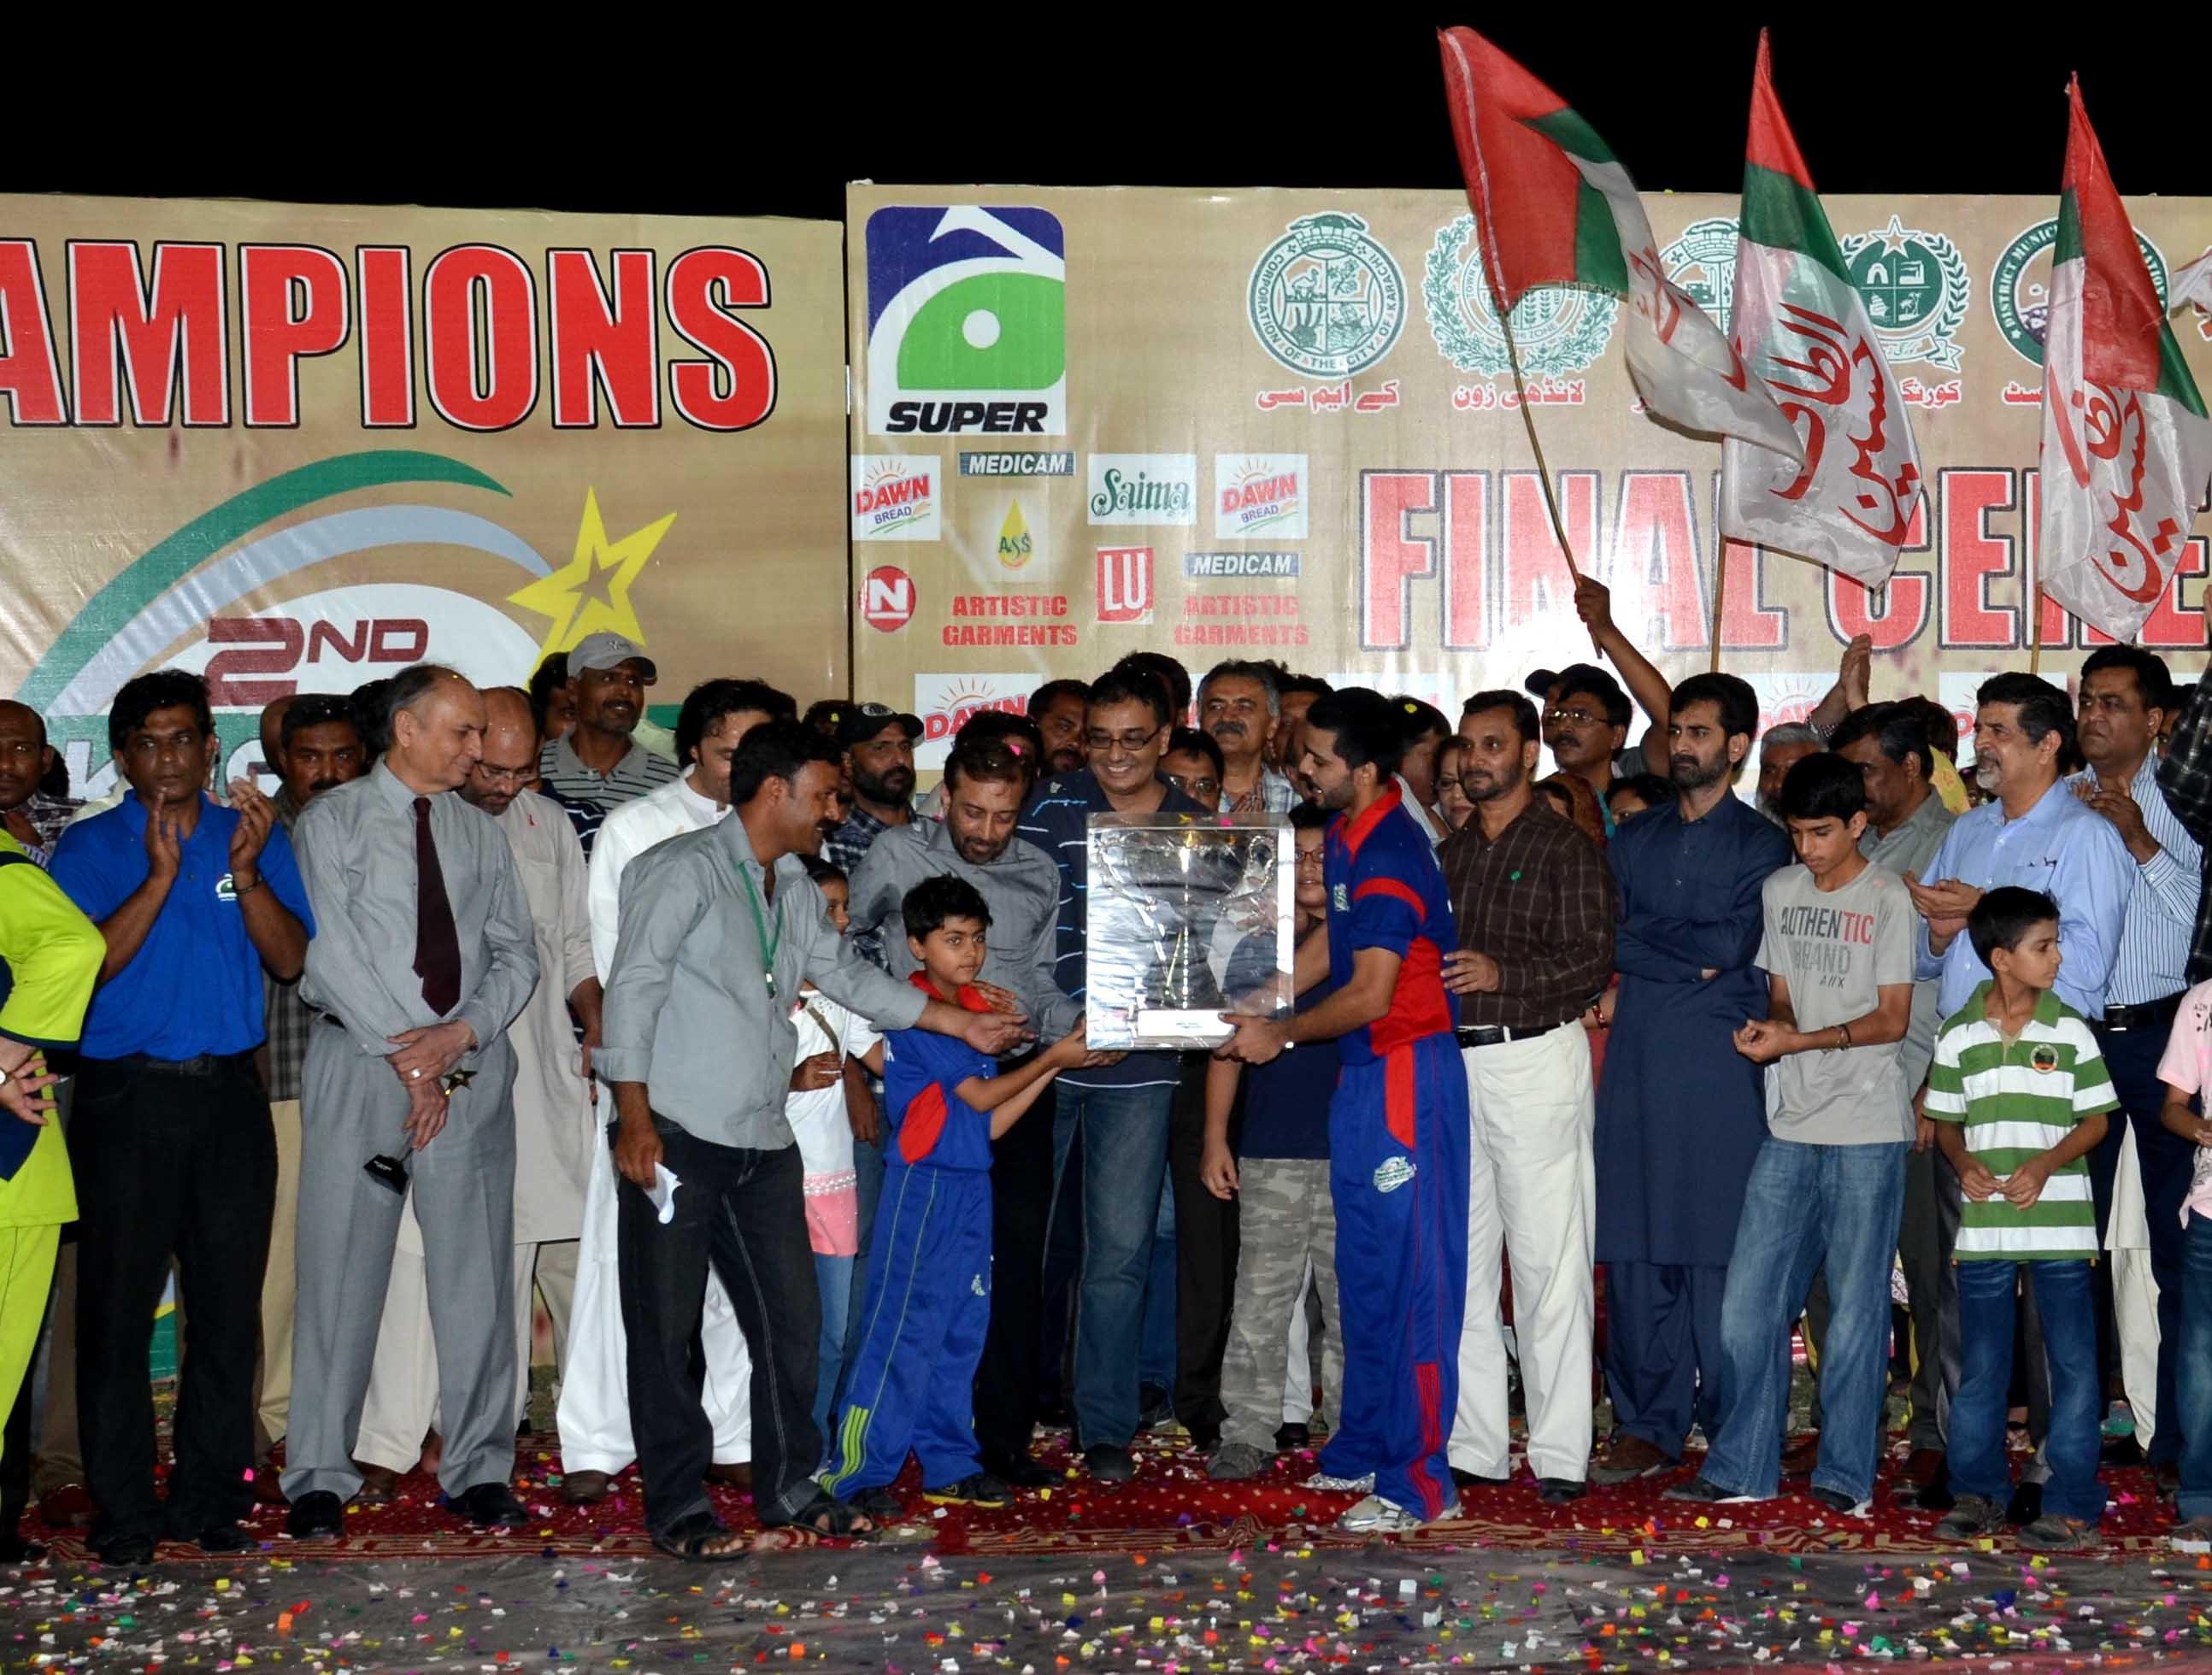 Pakistan Champions Cricket League 2012